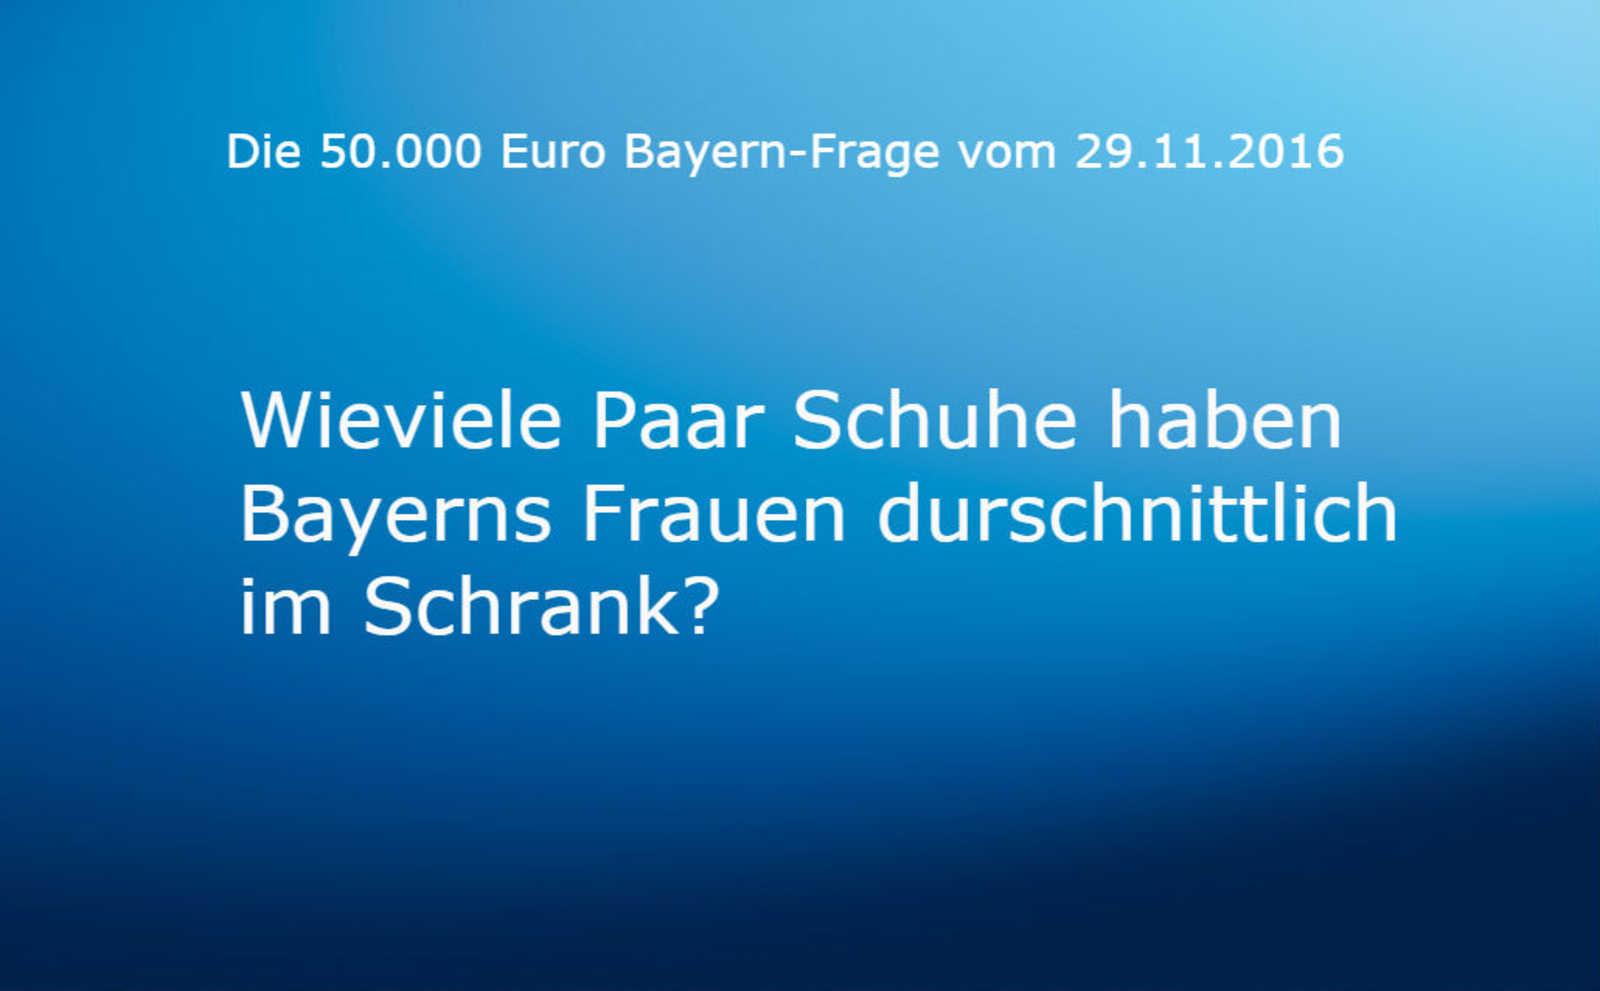 bayernfrage_2911